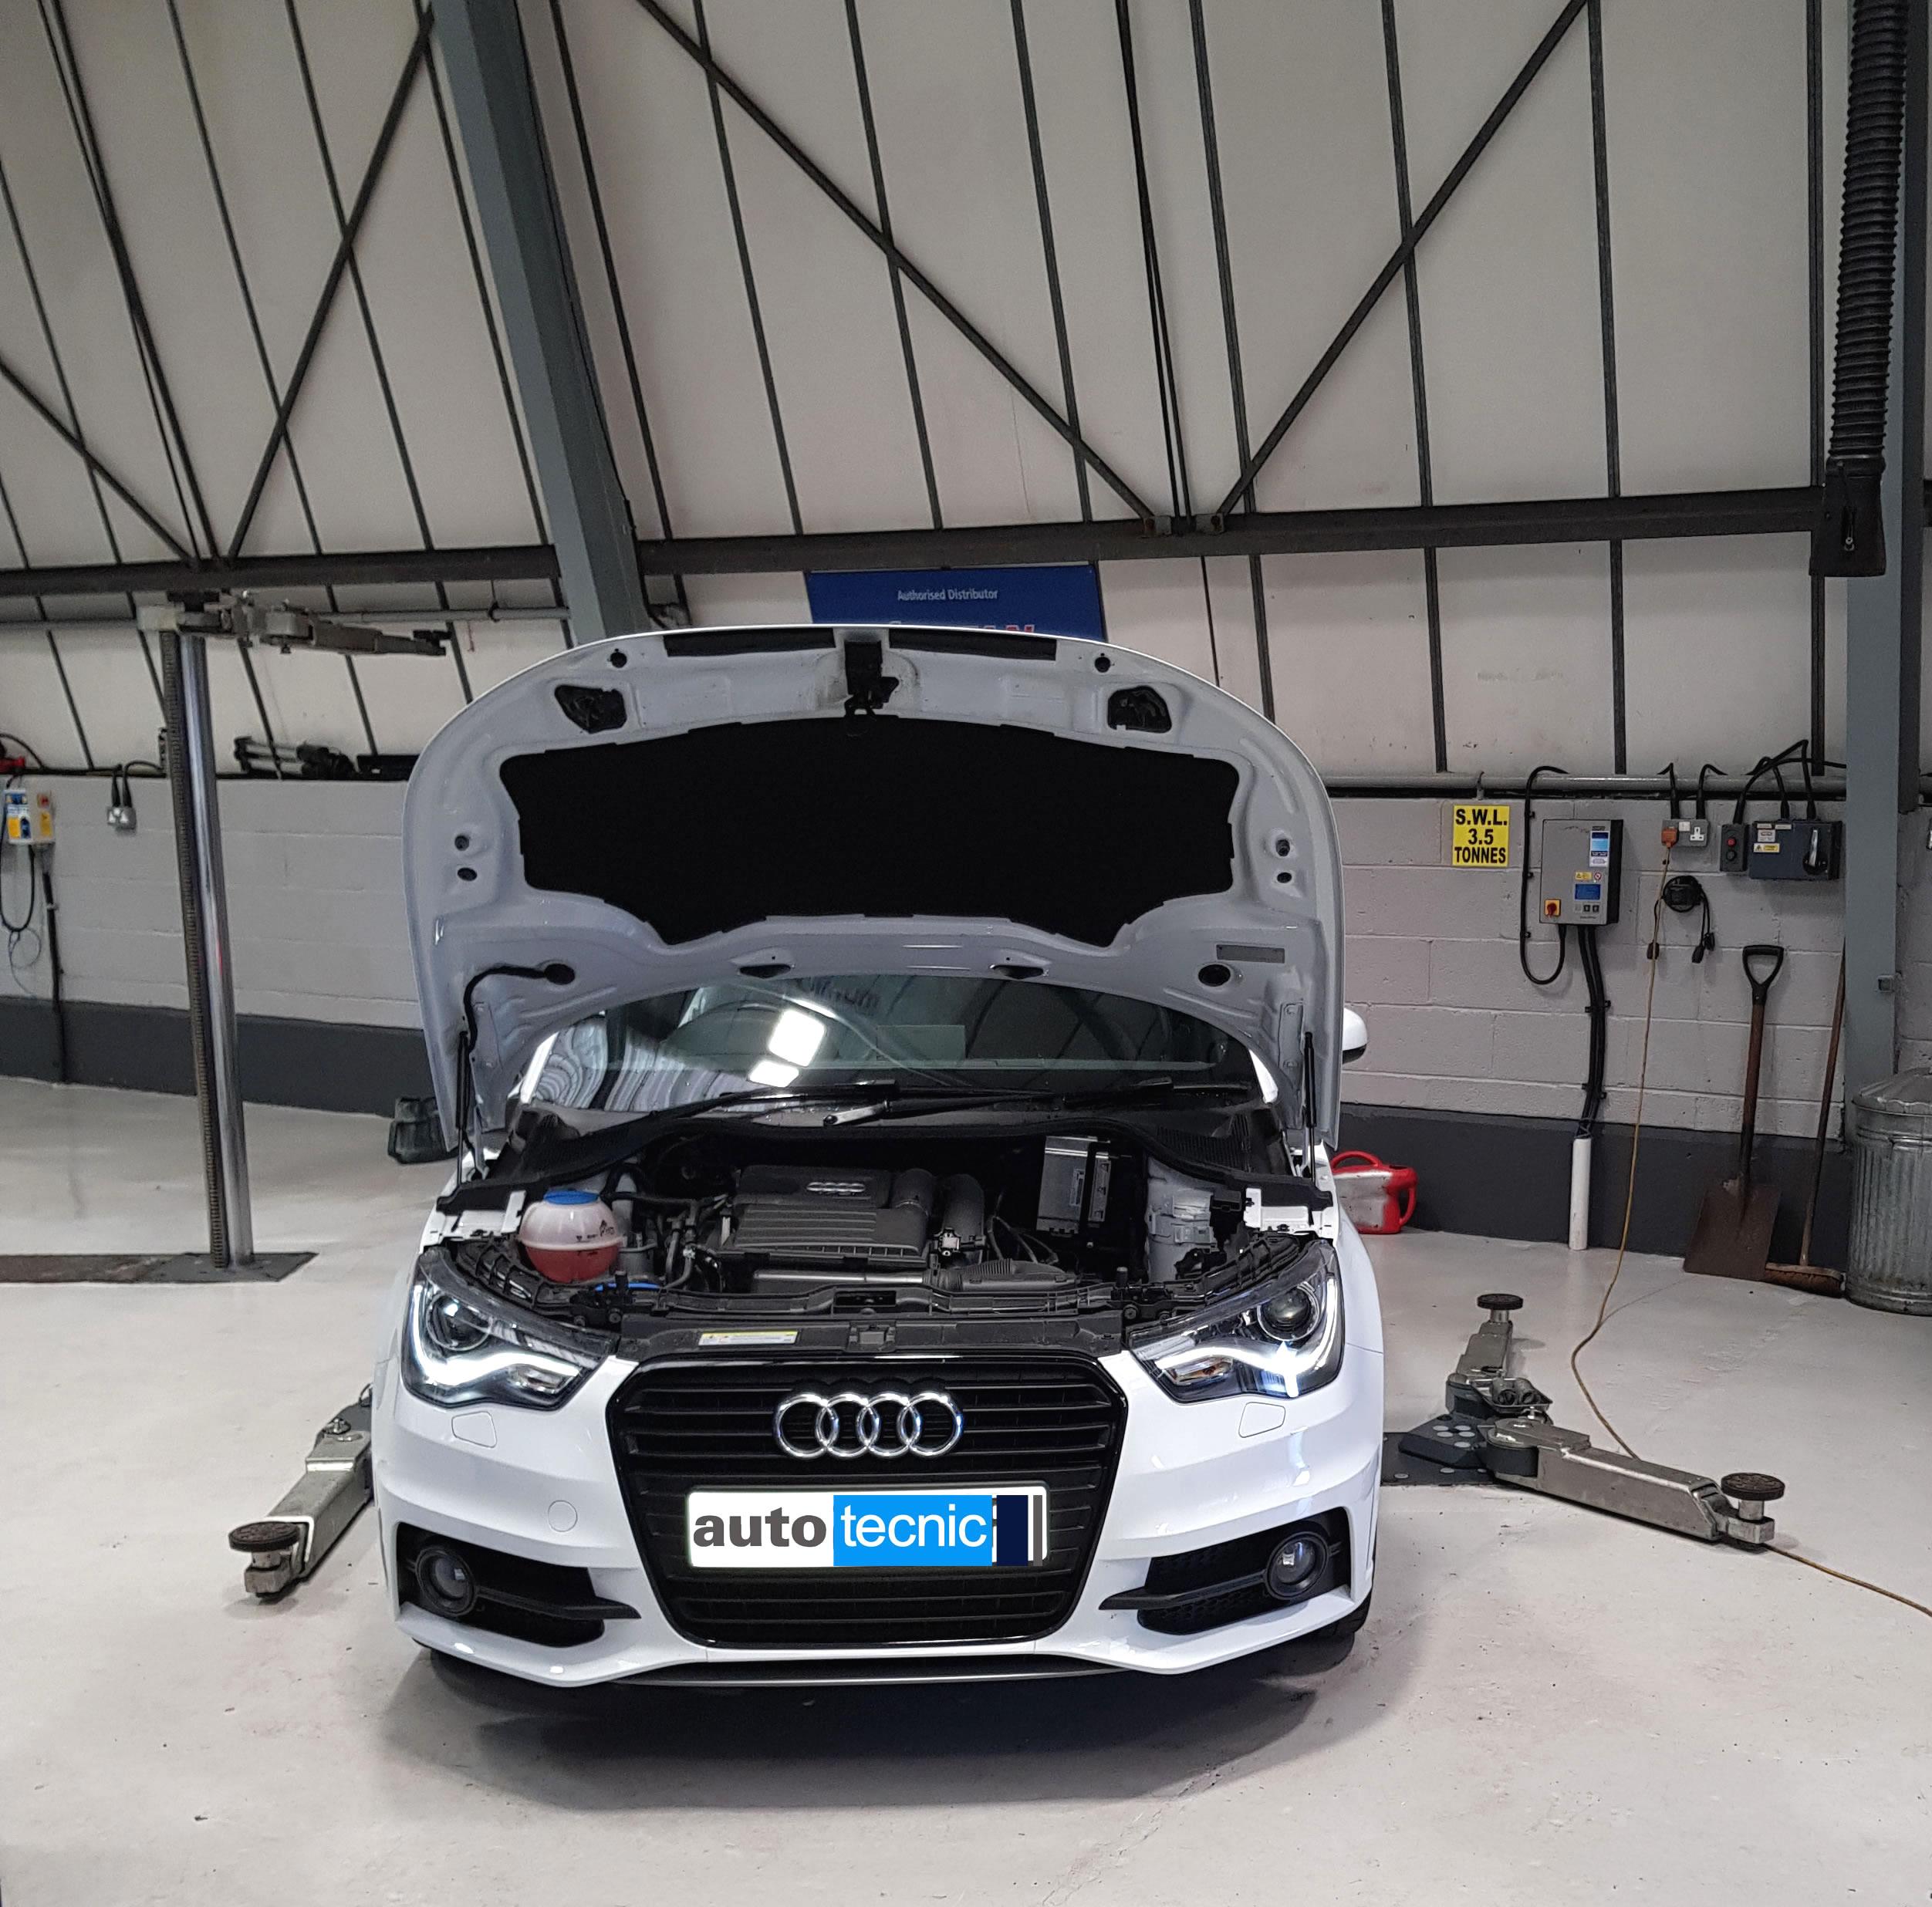 autotecnic - Audi A1